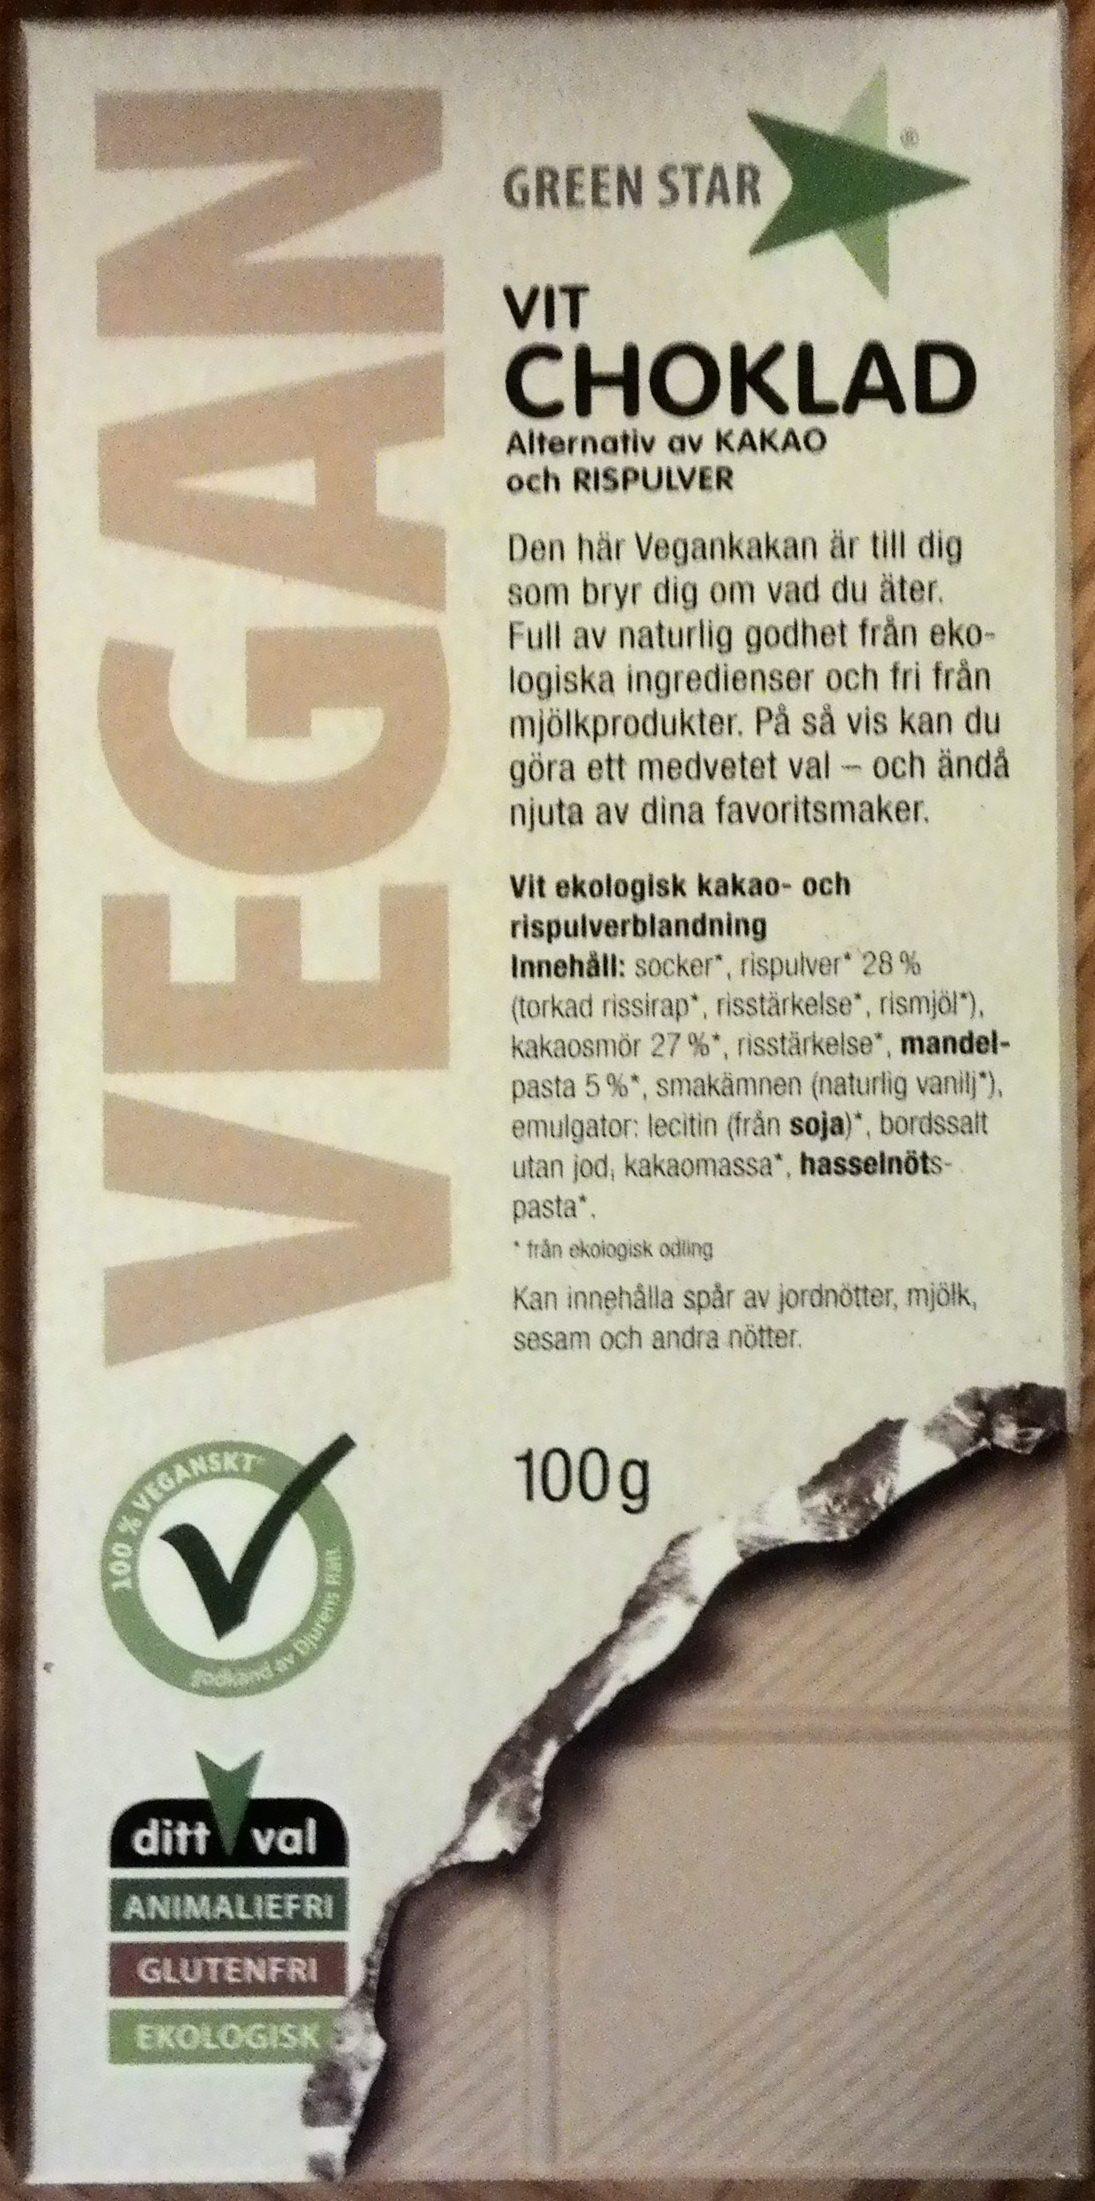 Green Star Vit Choklad - Product